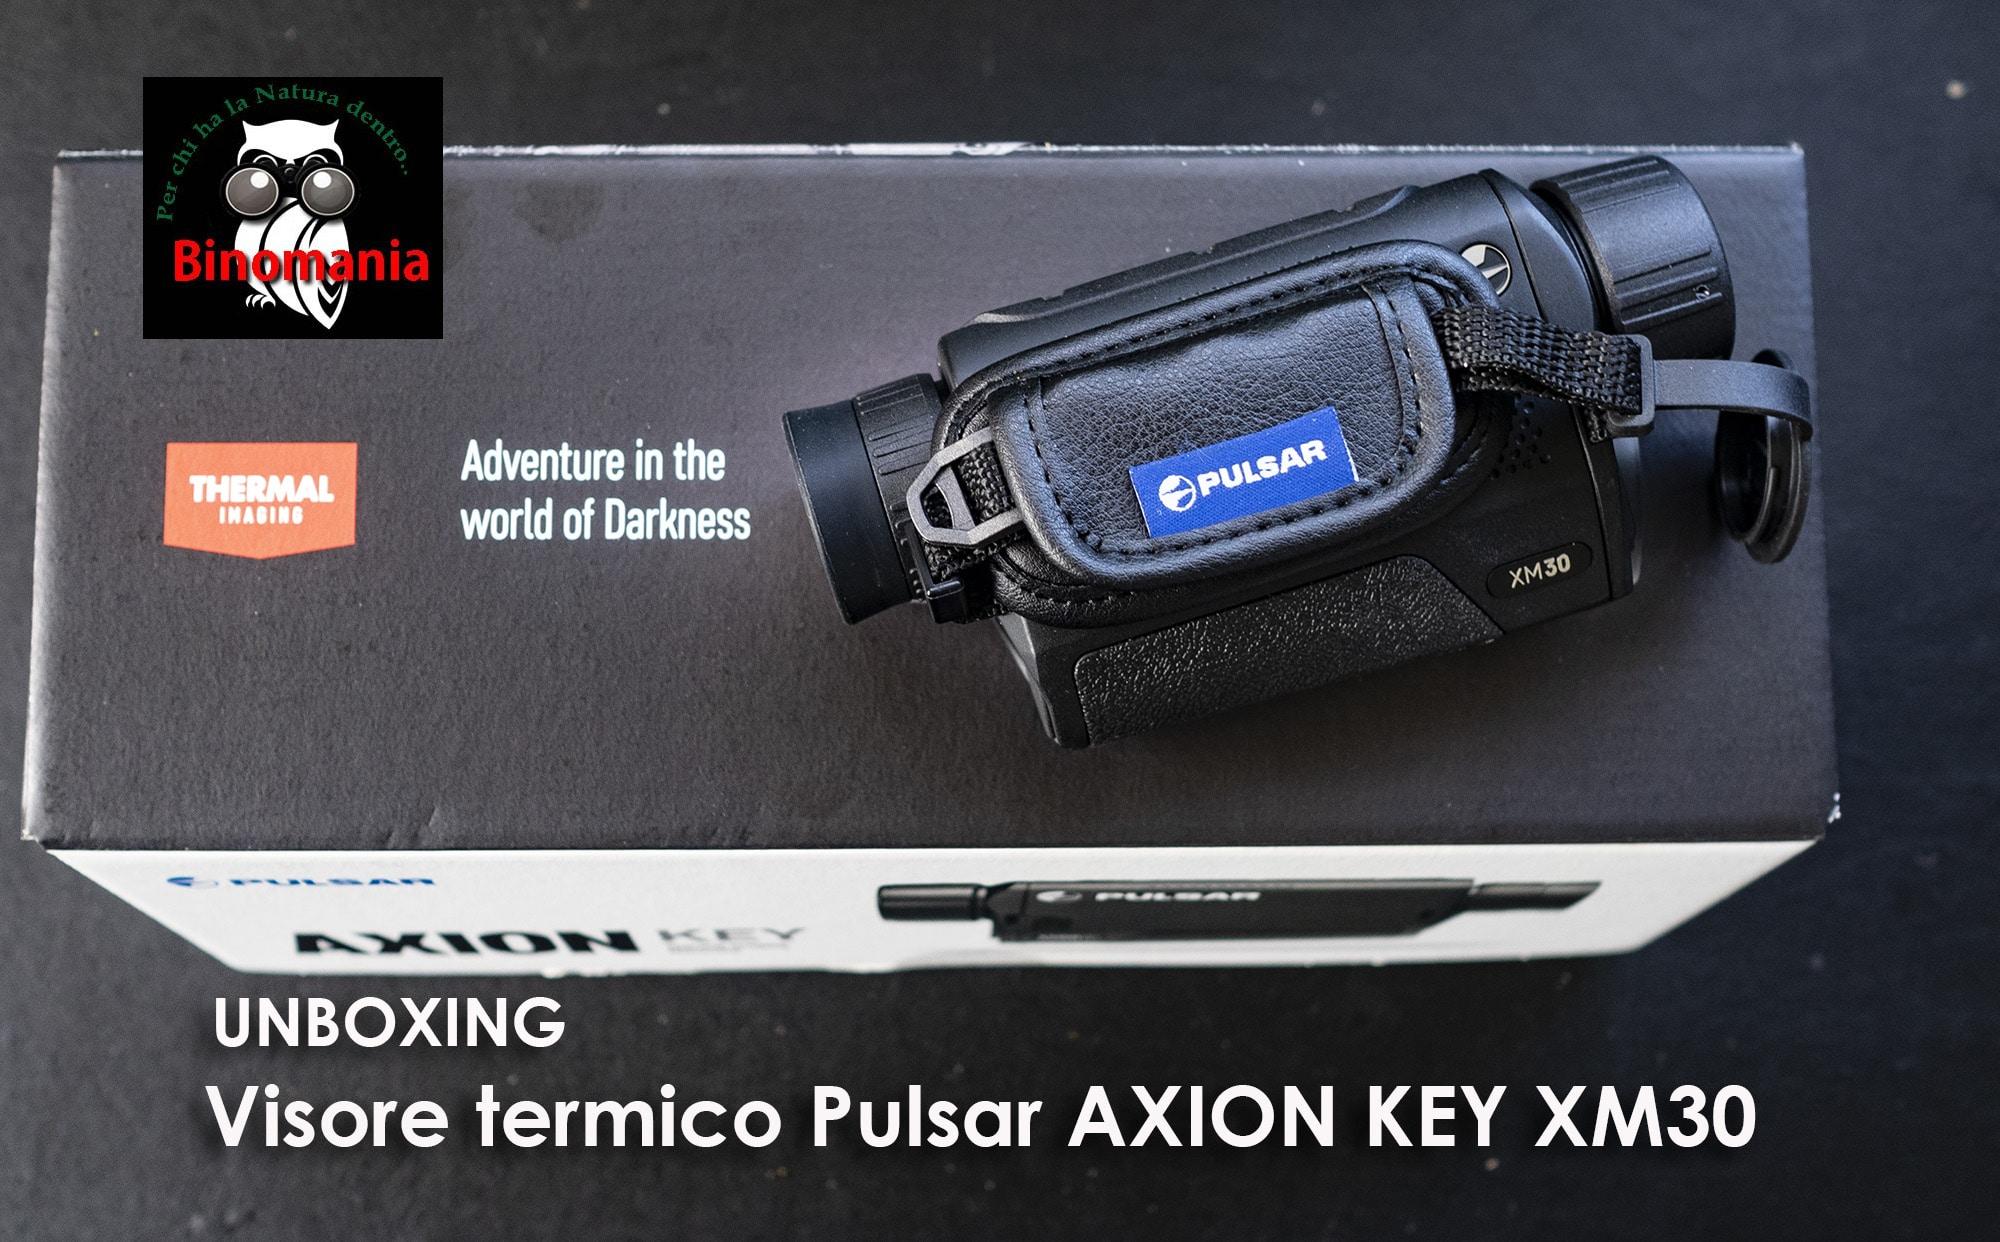 Visore termico Pulsar Axion Key XM30: prime impressioni